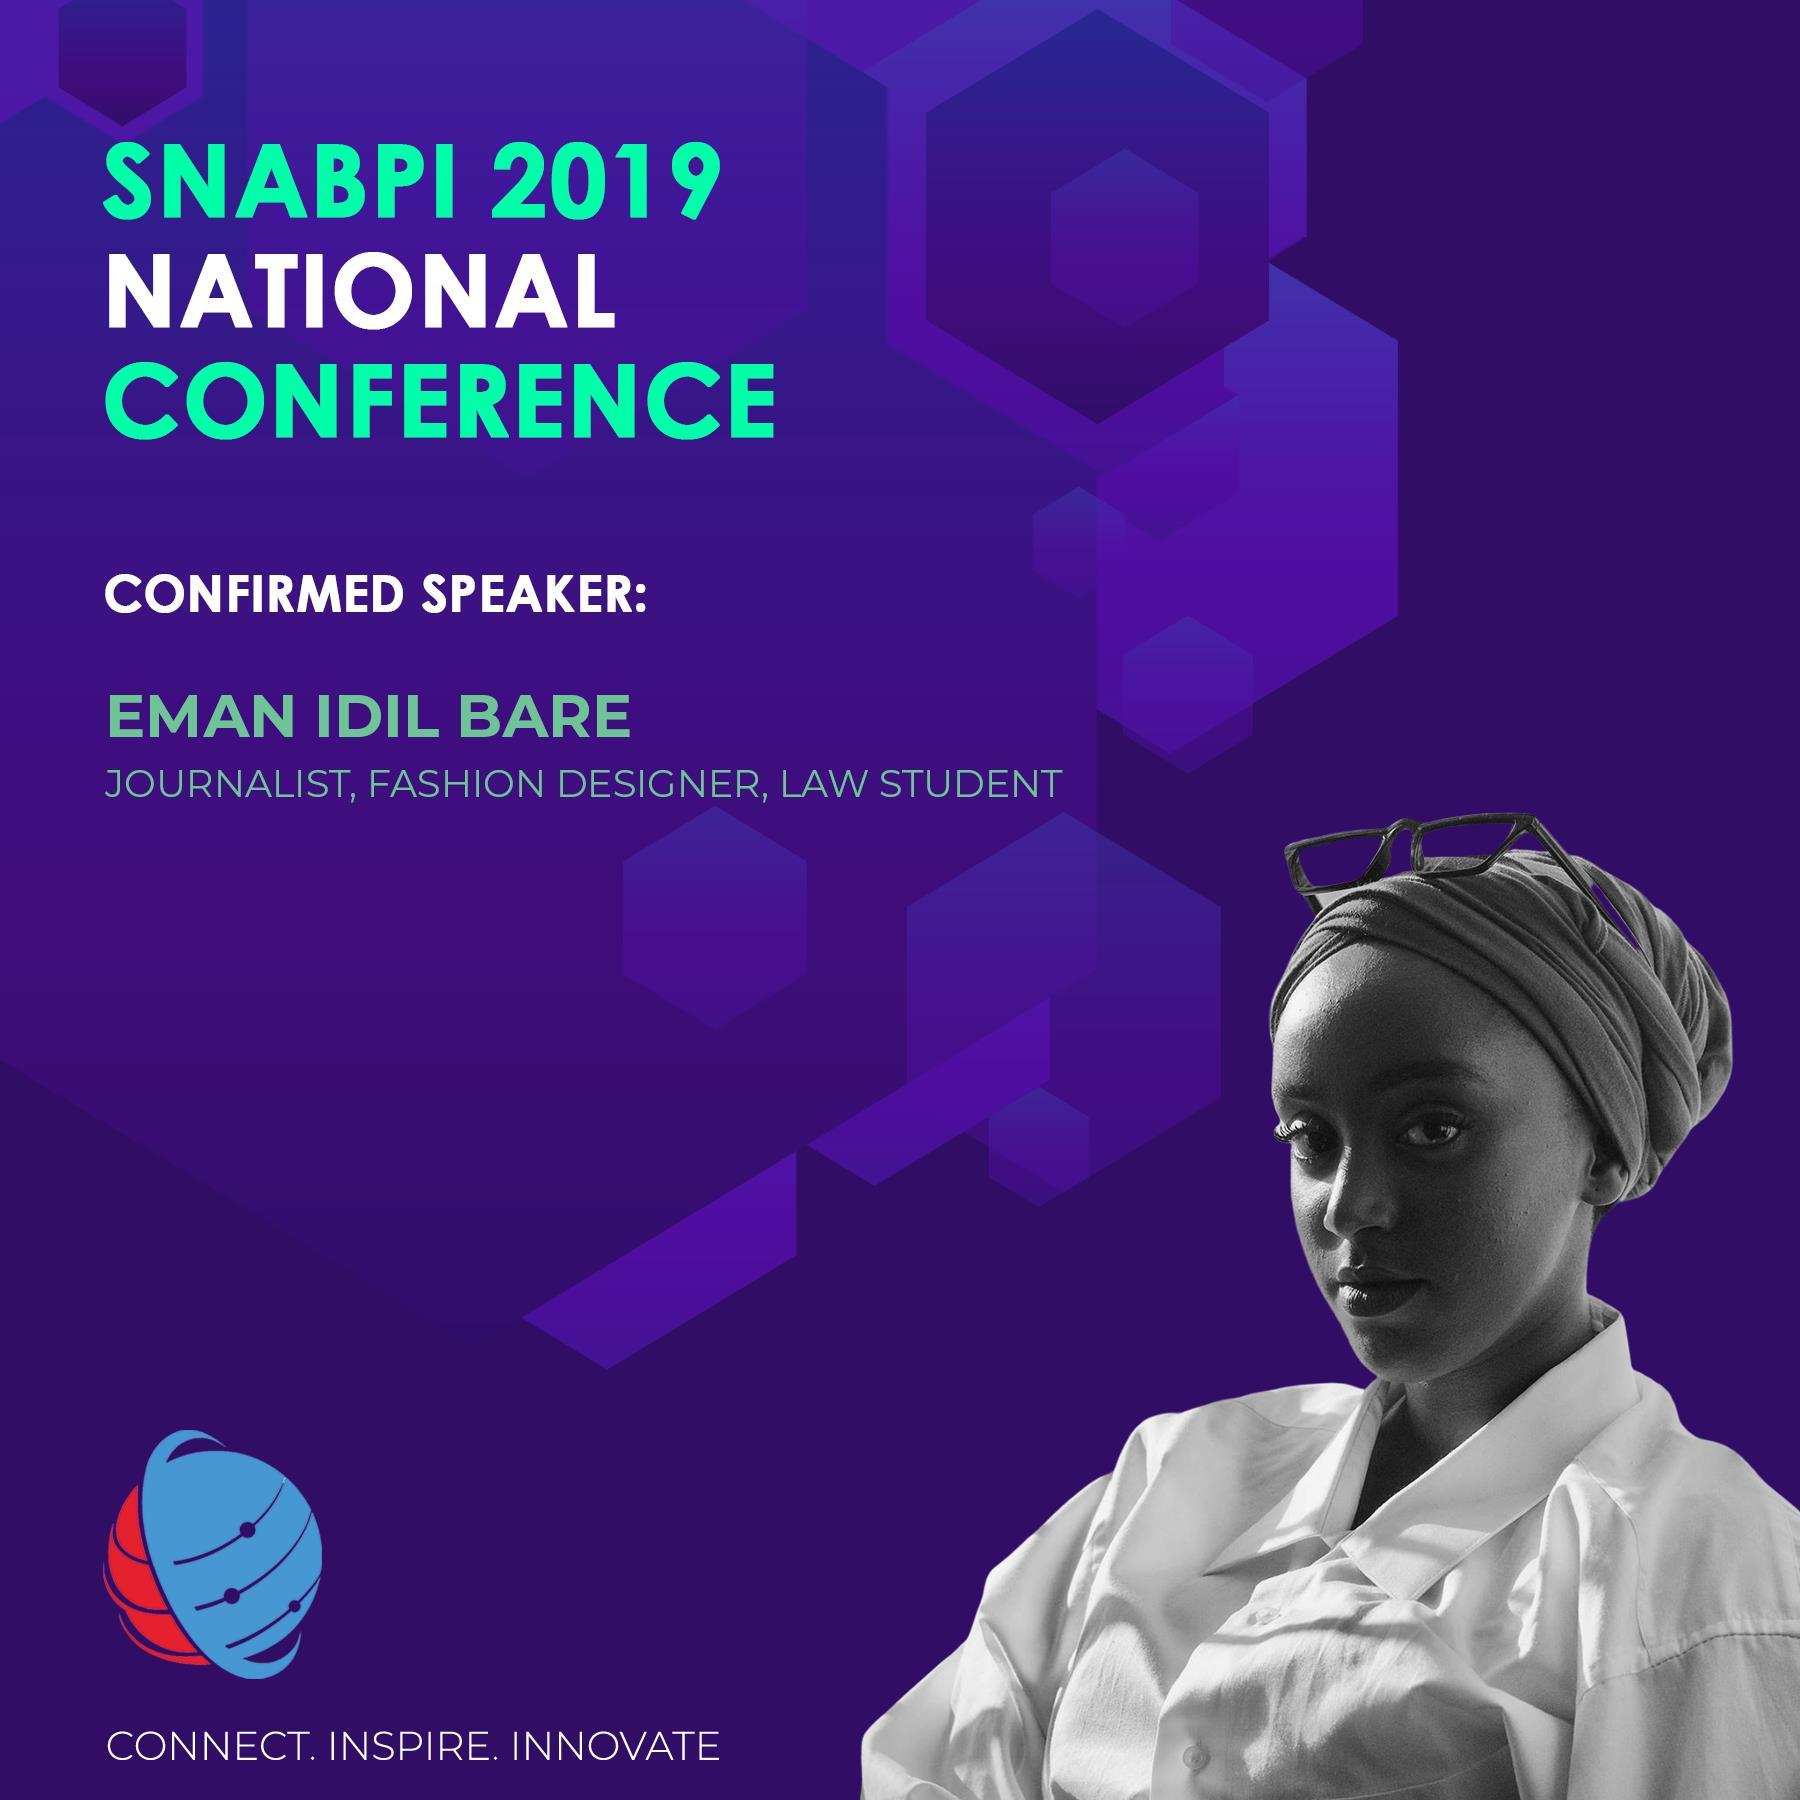 Thumbnail photo credit : Abdullahi Hassan for SNABPI, speaker biography courtesy of SNABPI